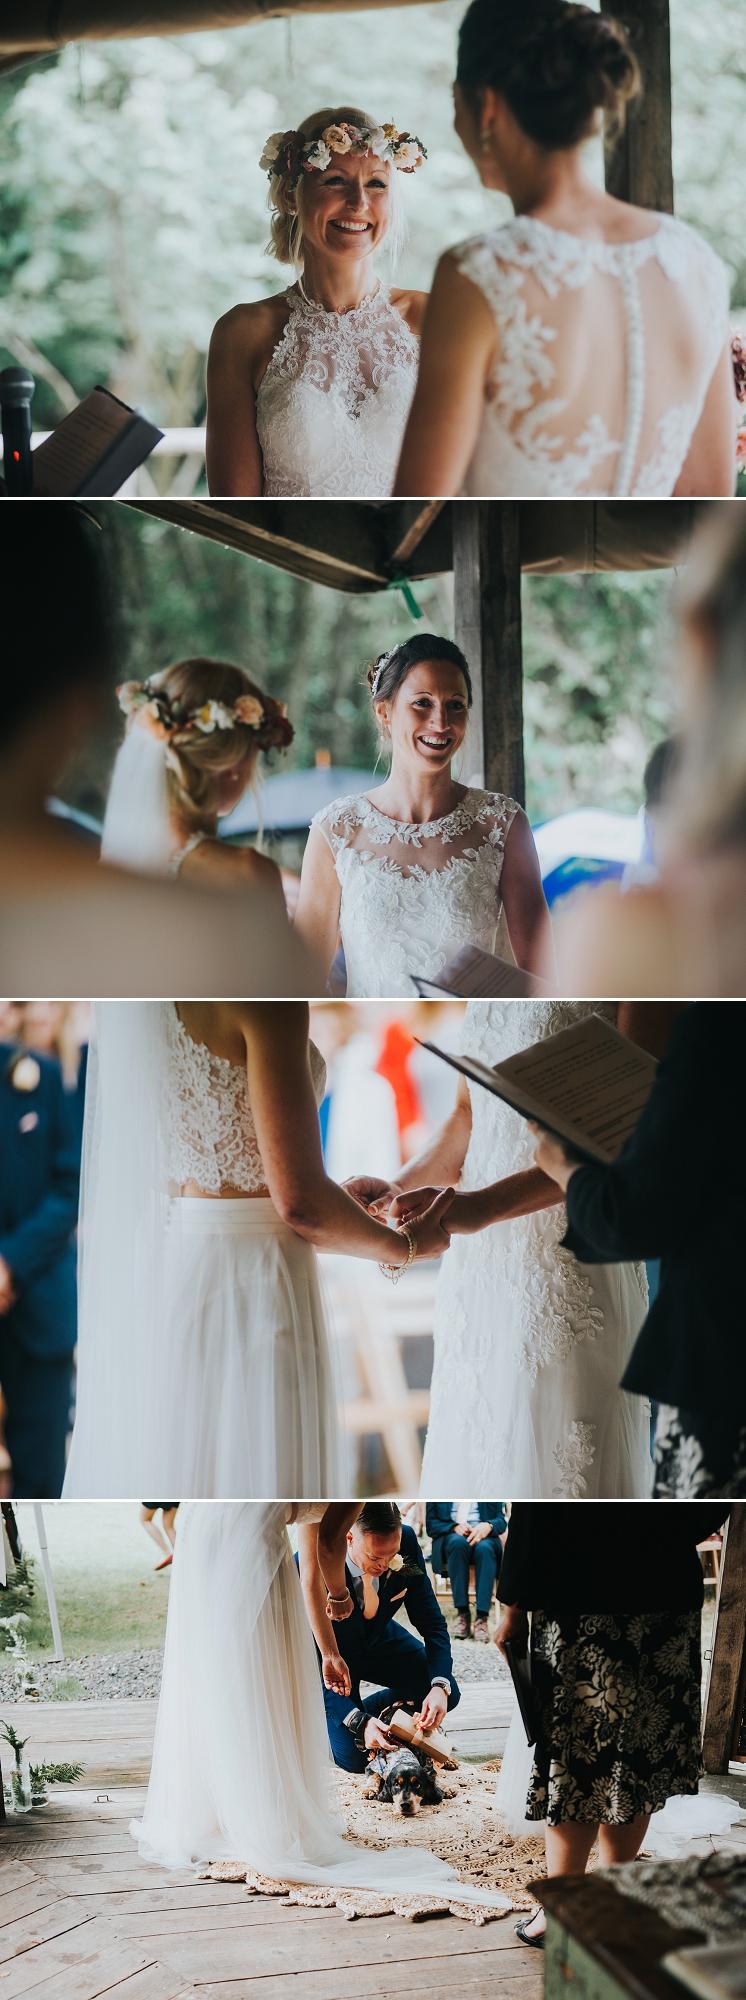 Brighton-wedding-photographer_0015.jpg